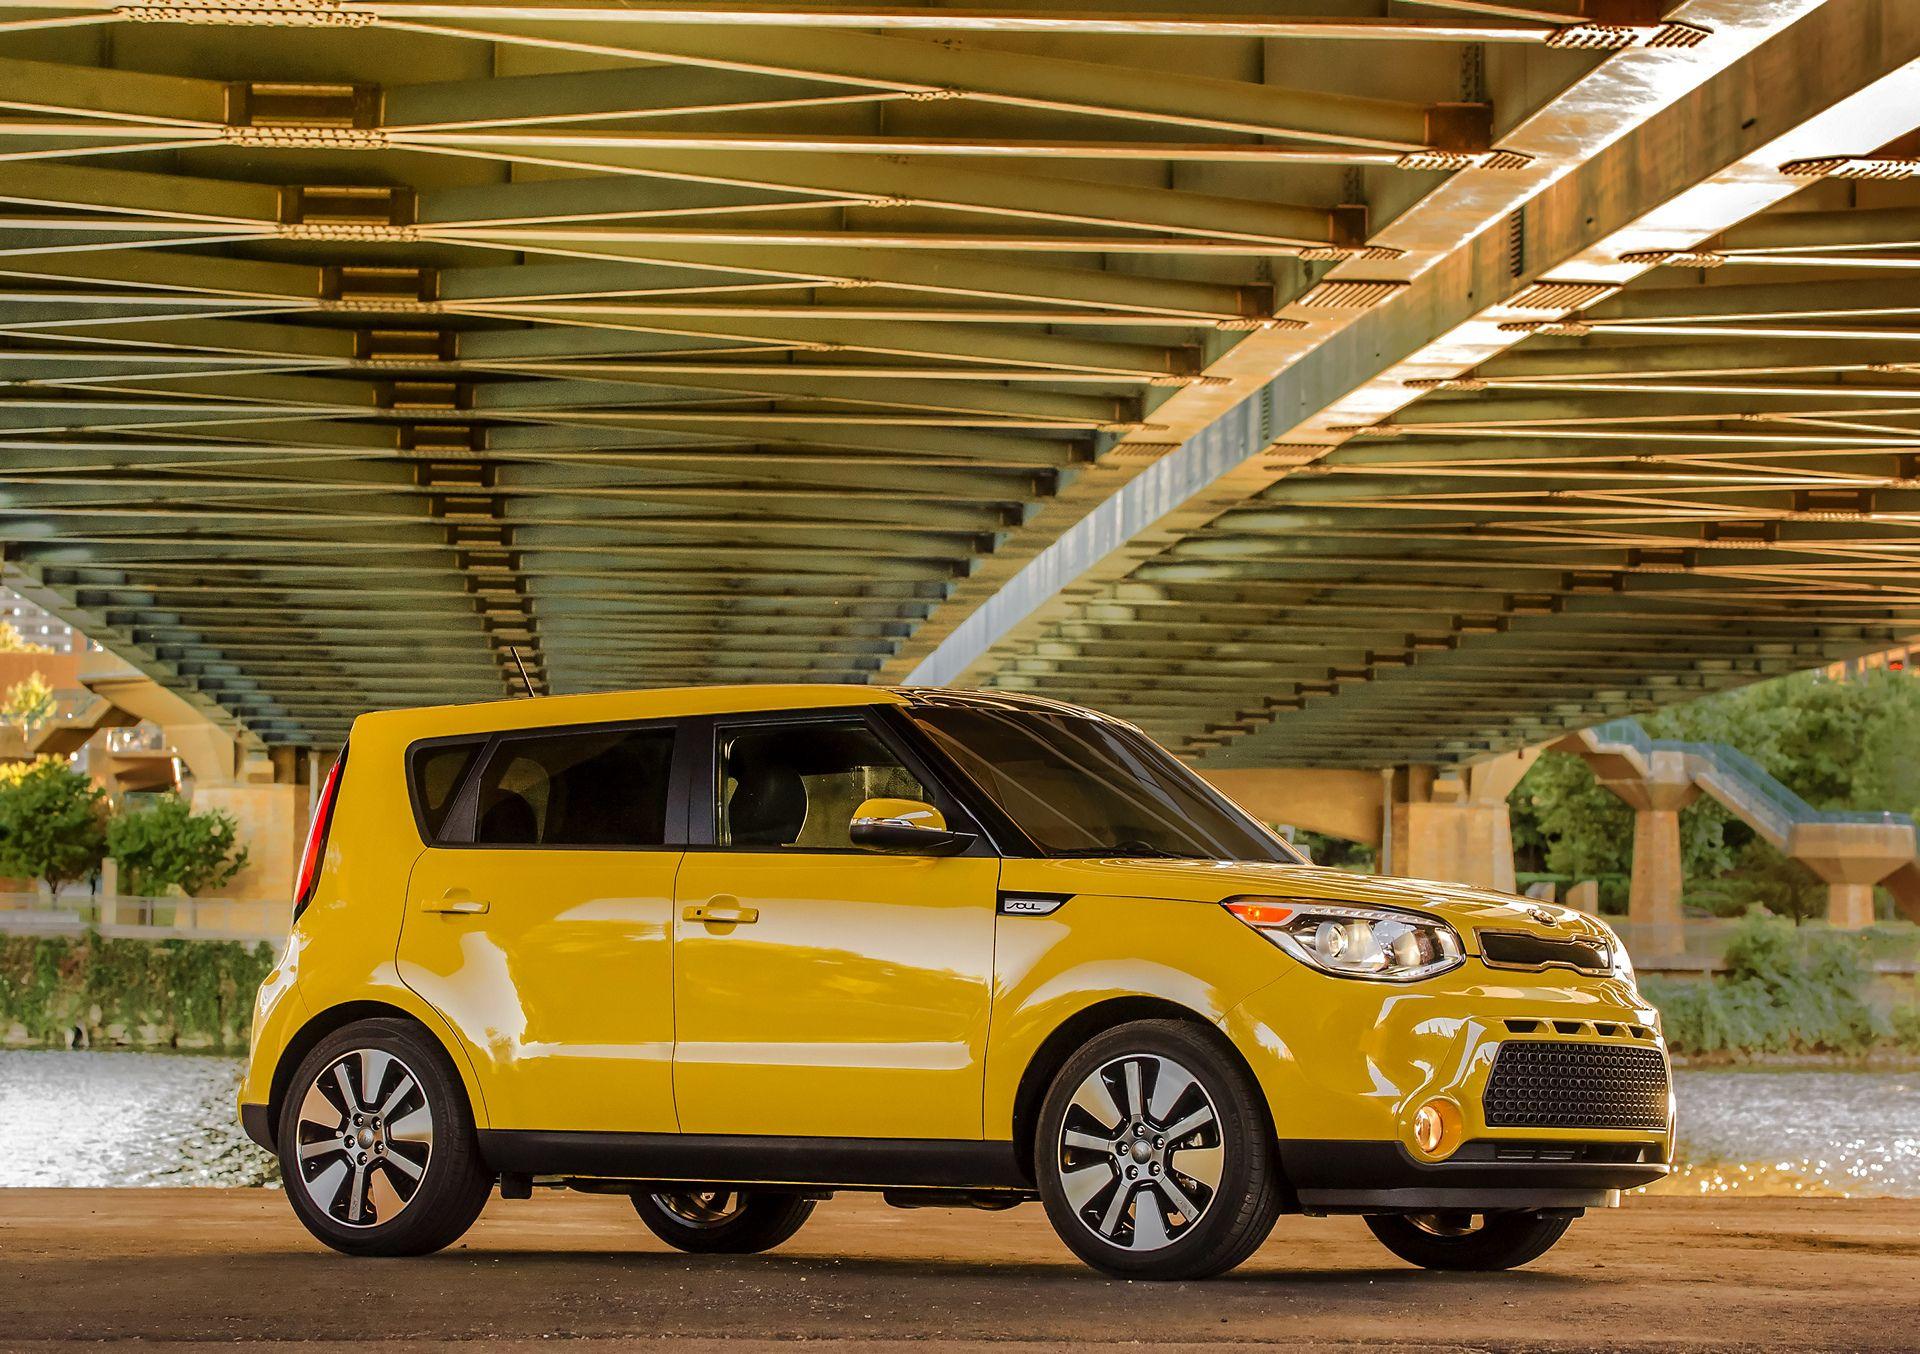 2016 Kia Soul Soul Ev Review Carrrs Auto Portal Kia Soul Best Cars For Teens Car For Teens